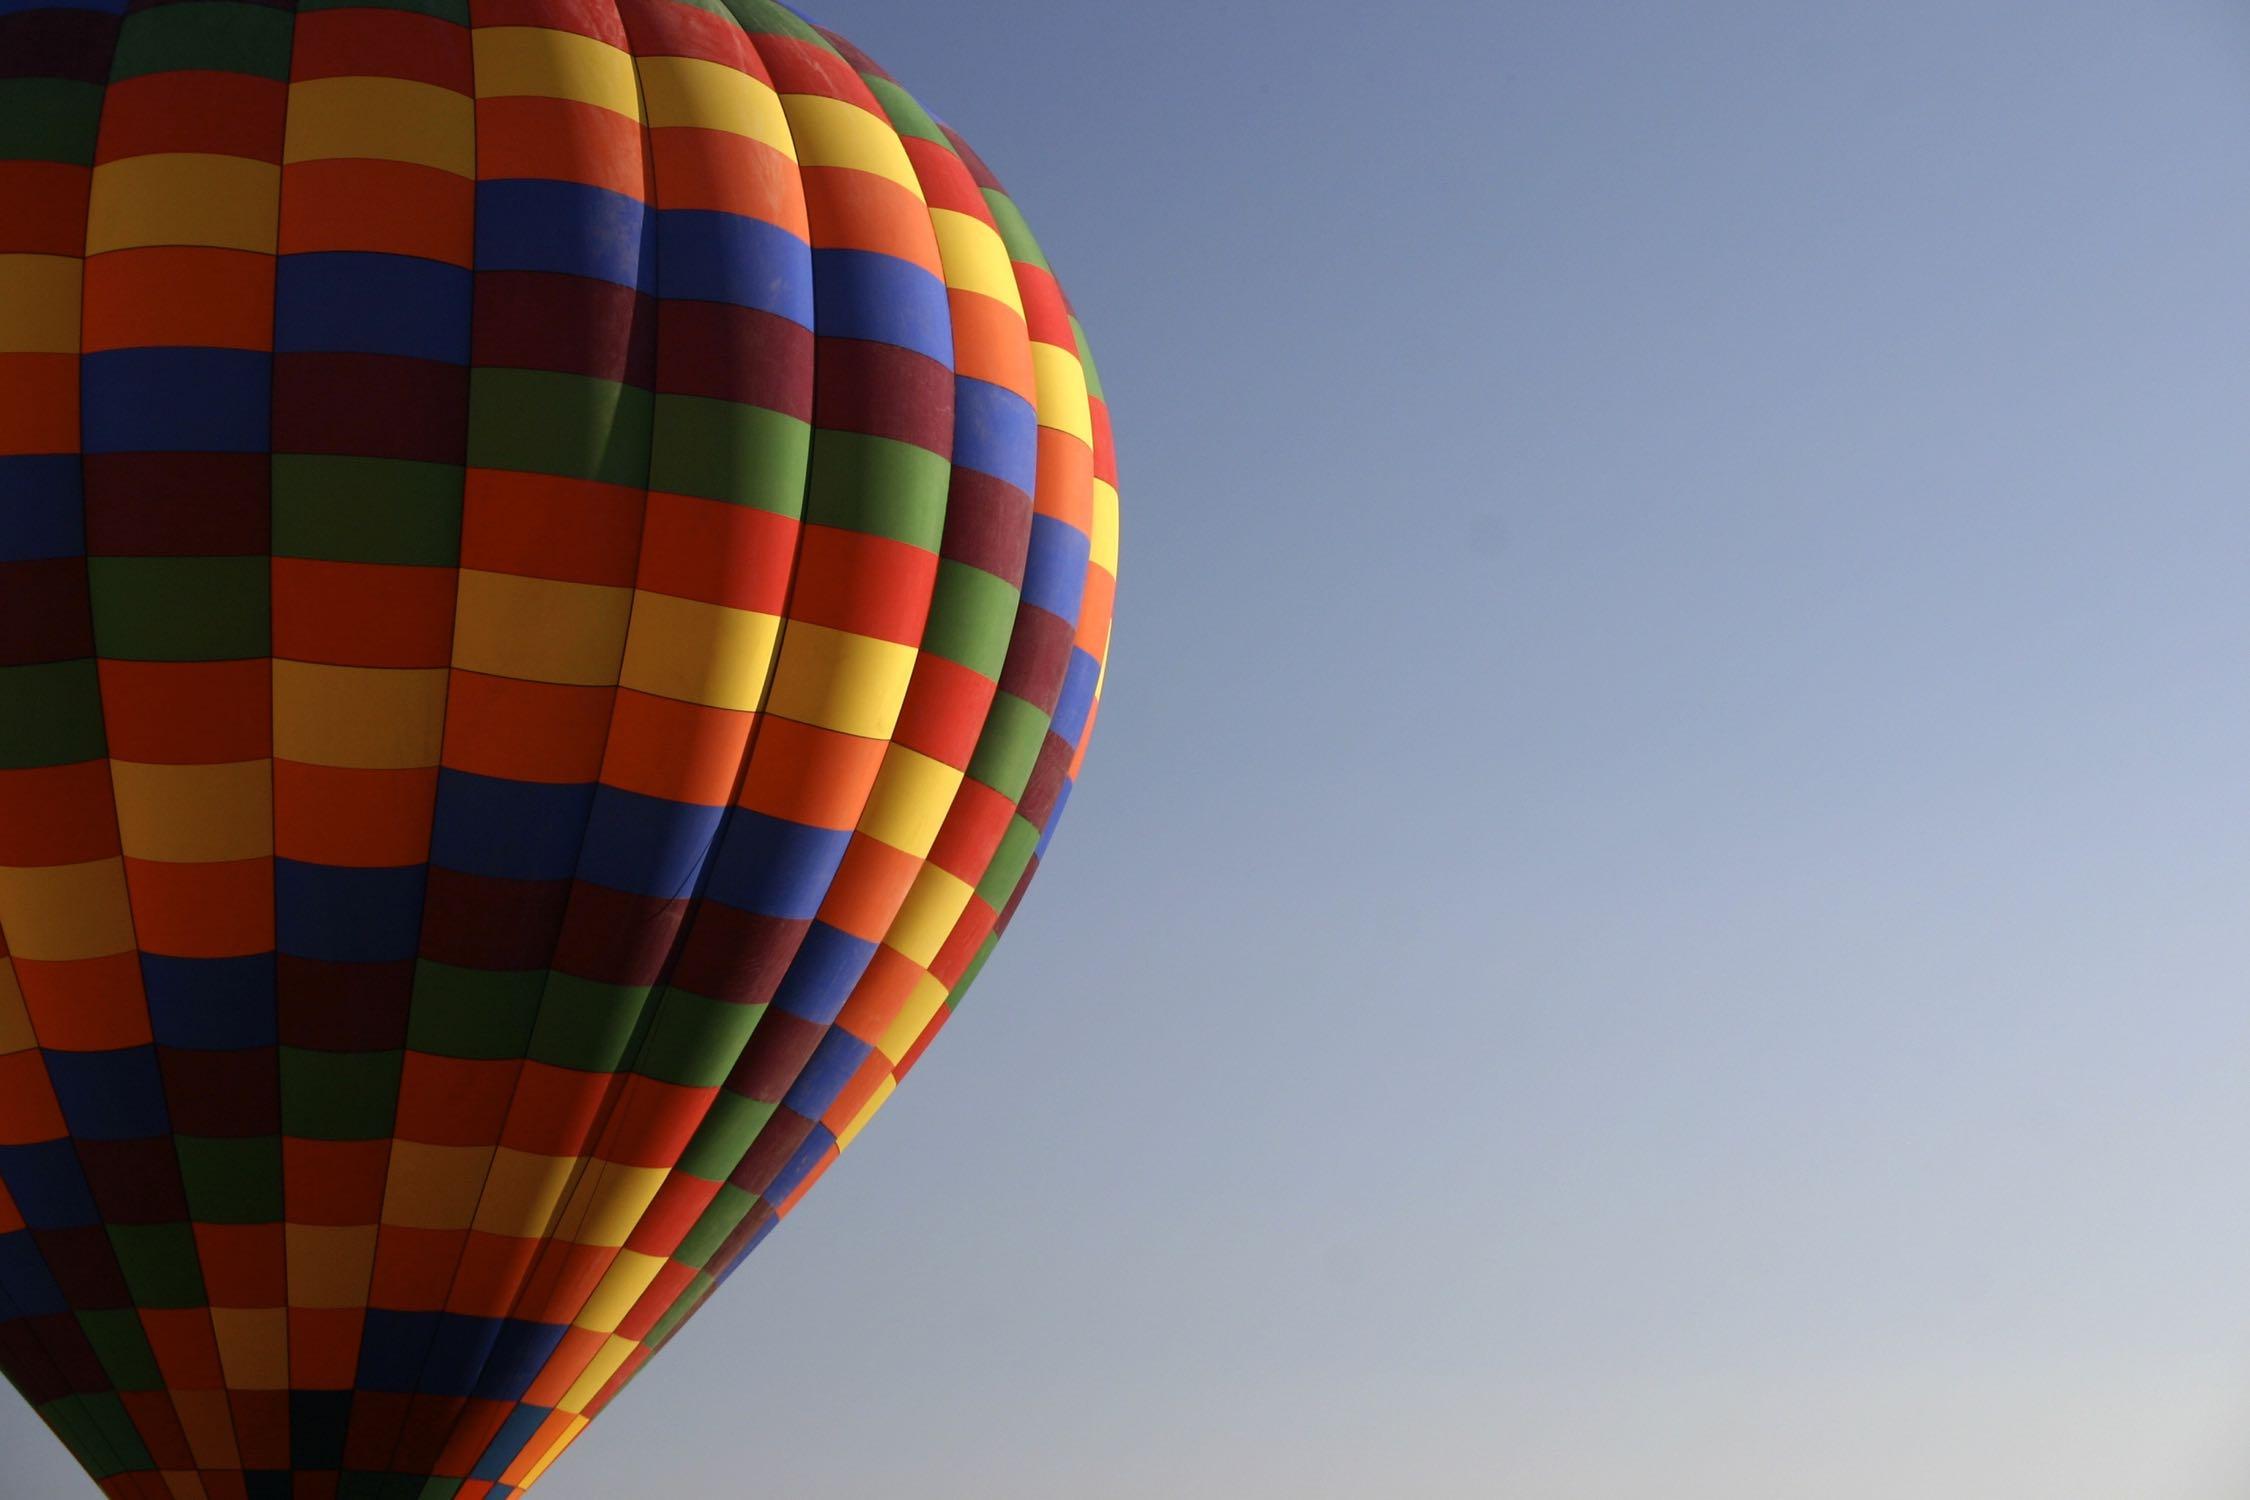 Balloon - Cappadocia, Turkey